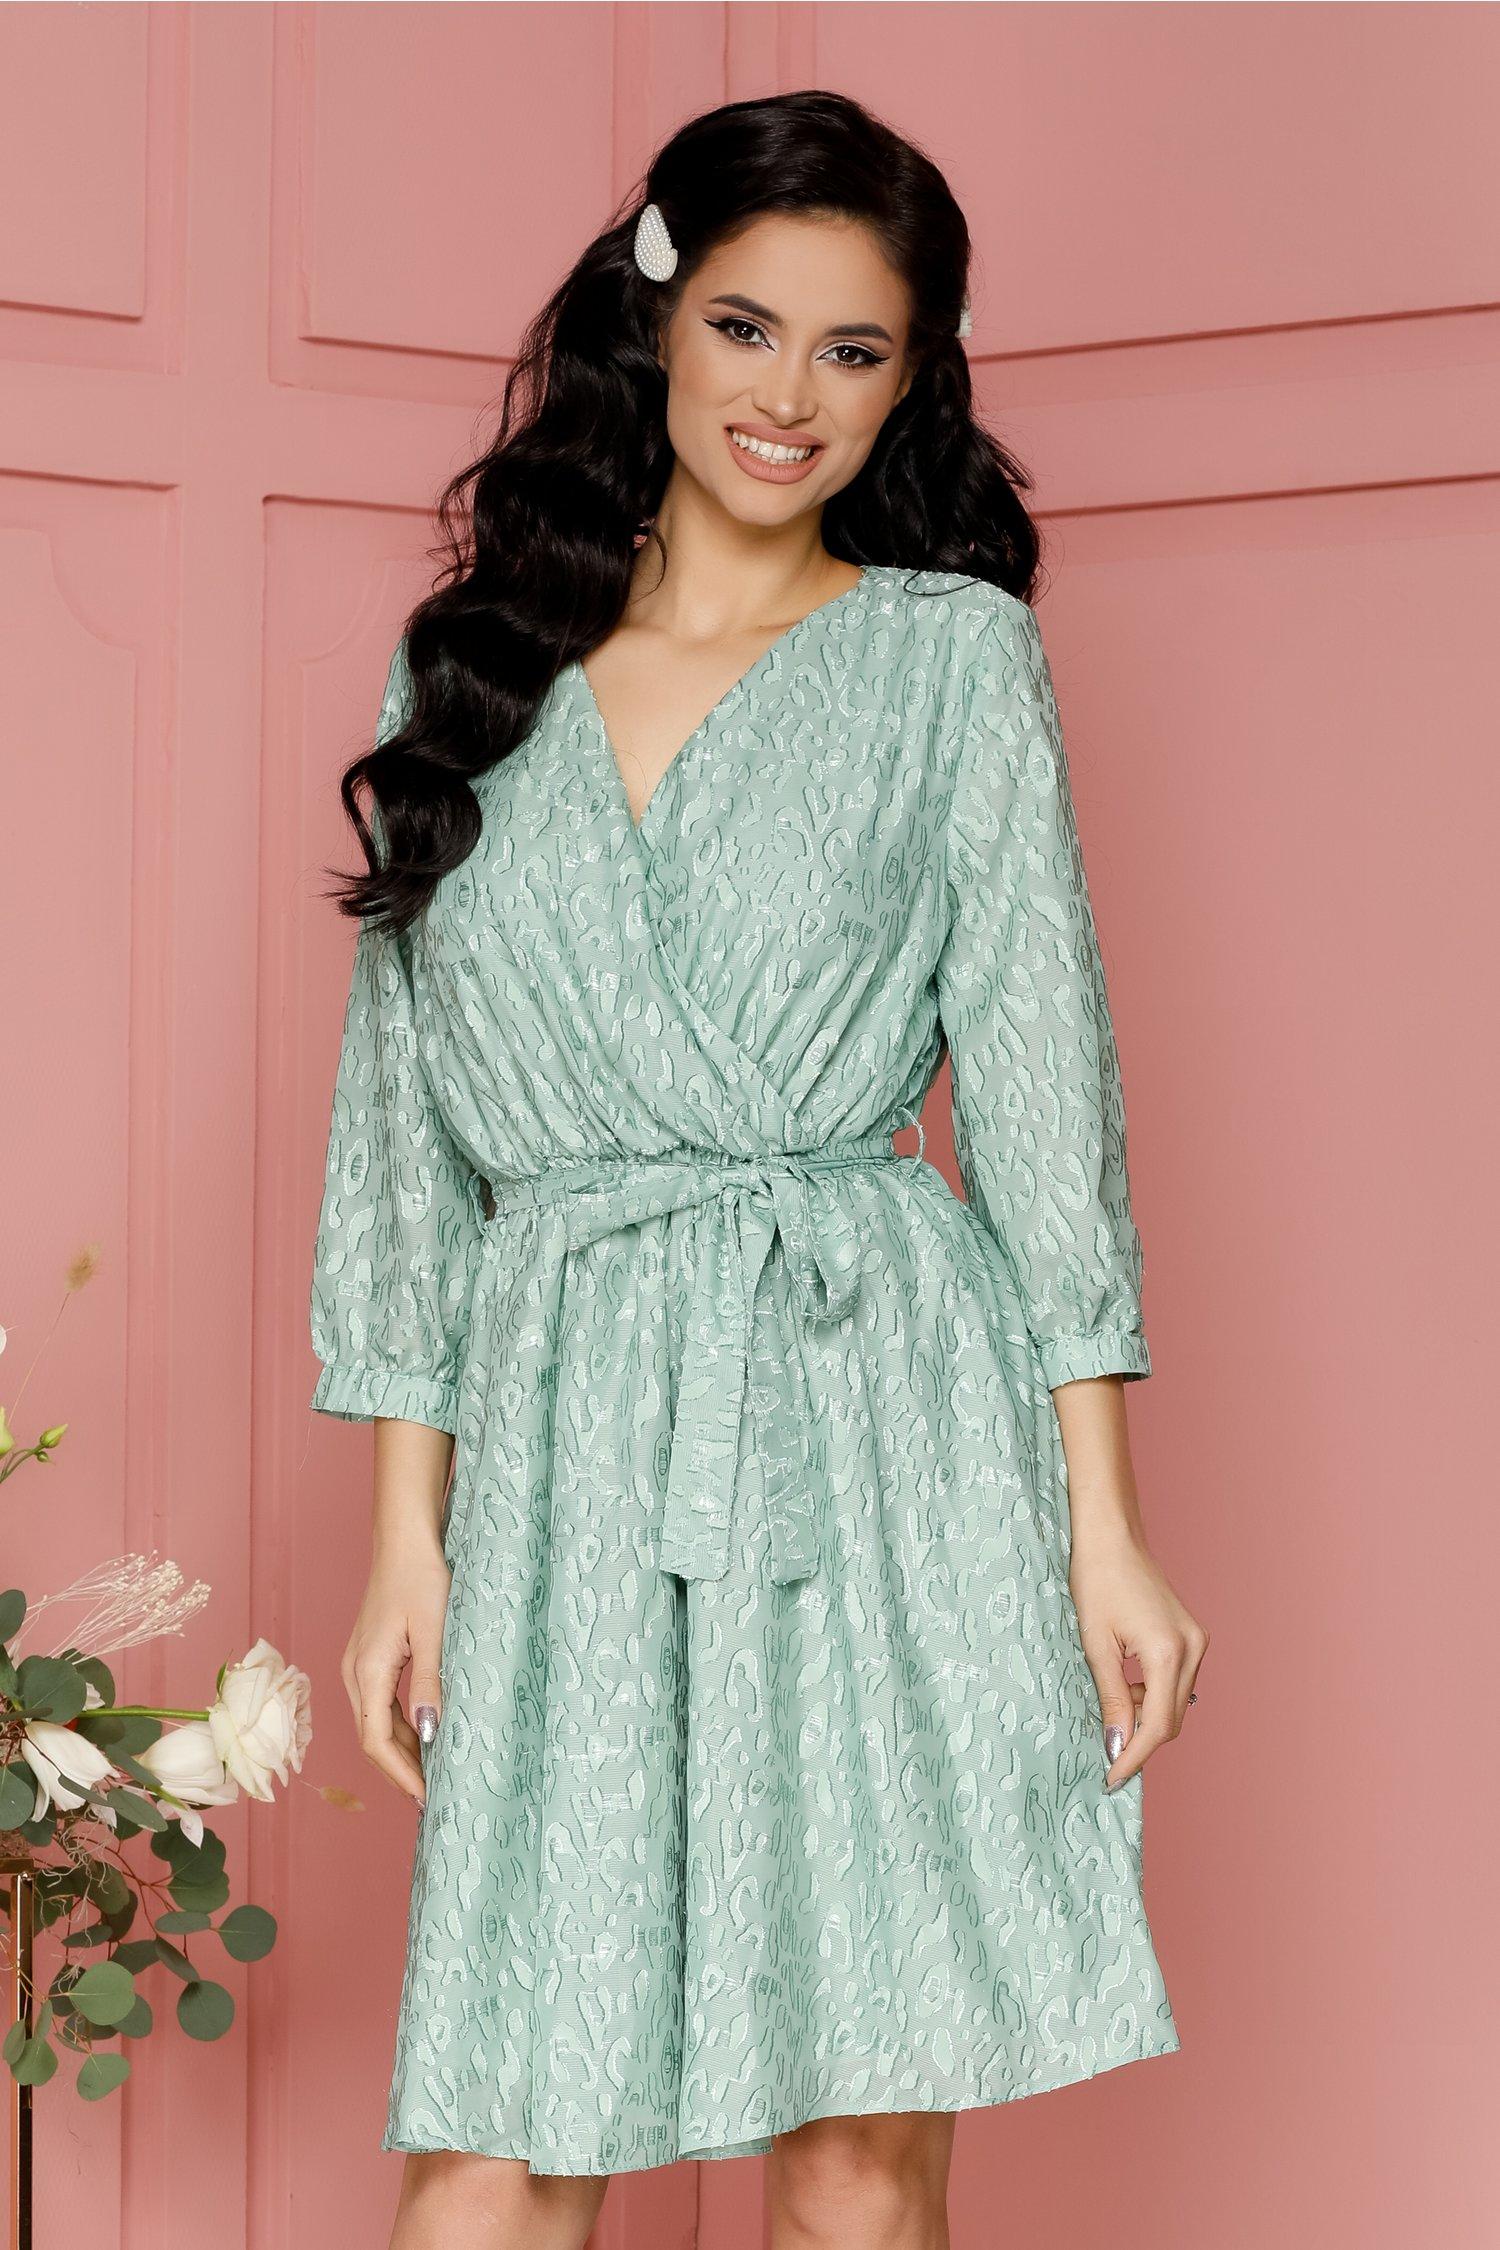 rochie mika verde mint cu model deosebit 486309 4